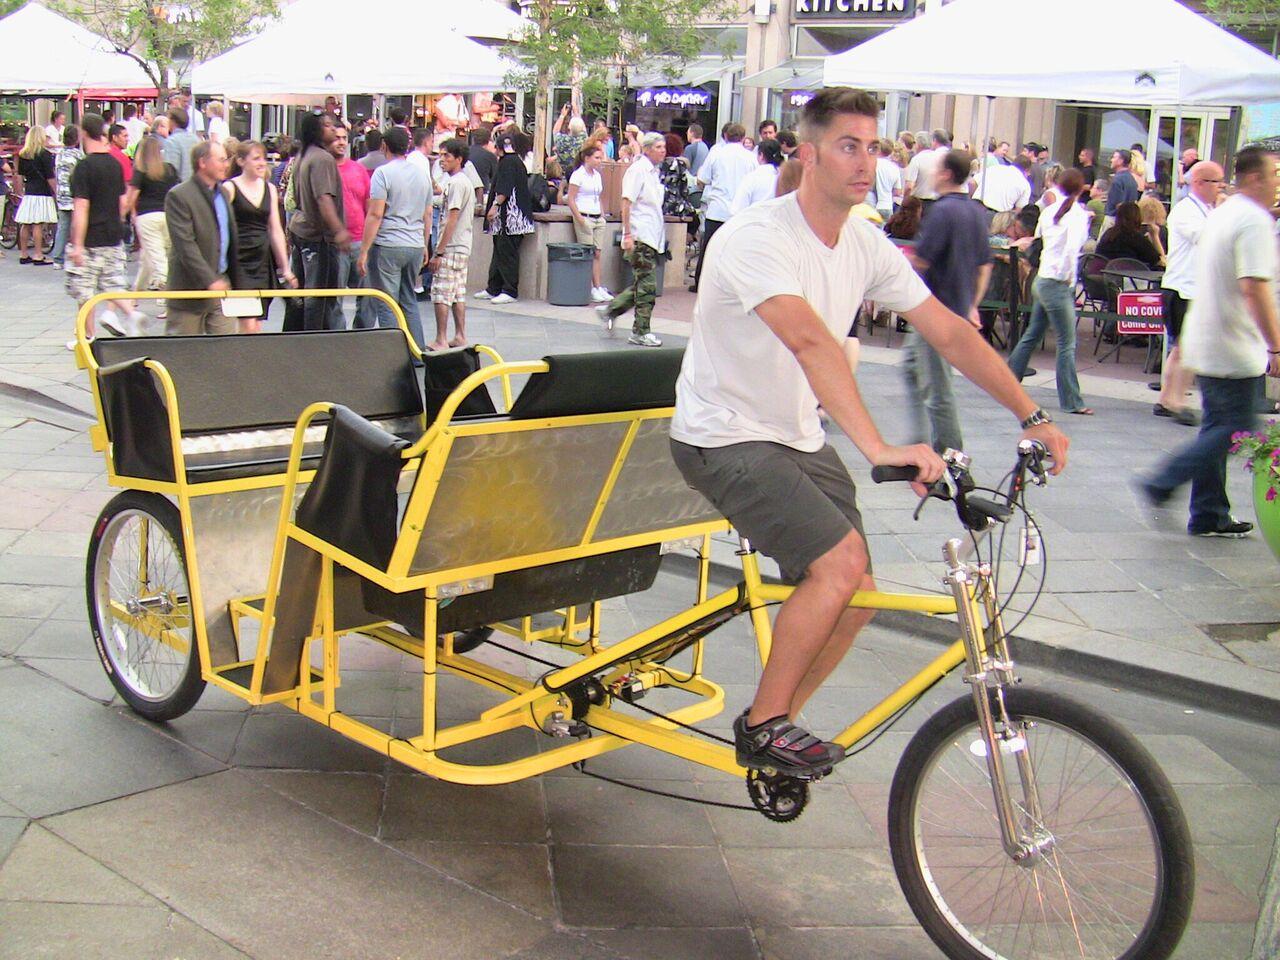 boardwalk-pedicab-features